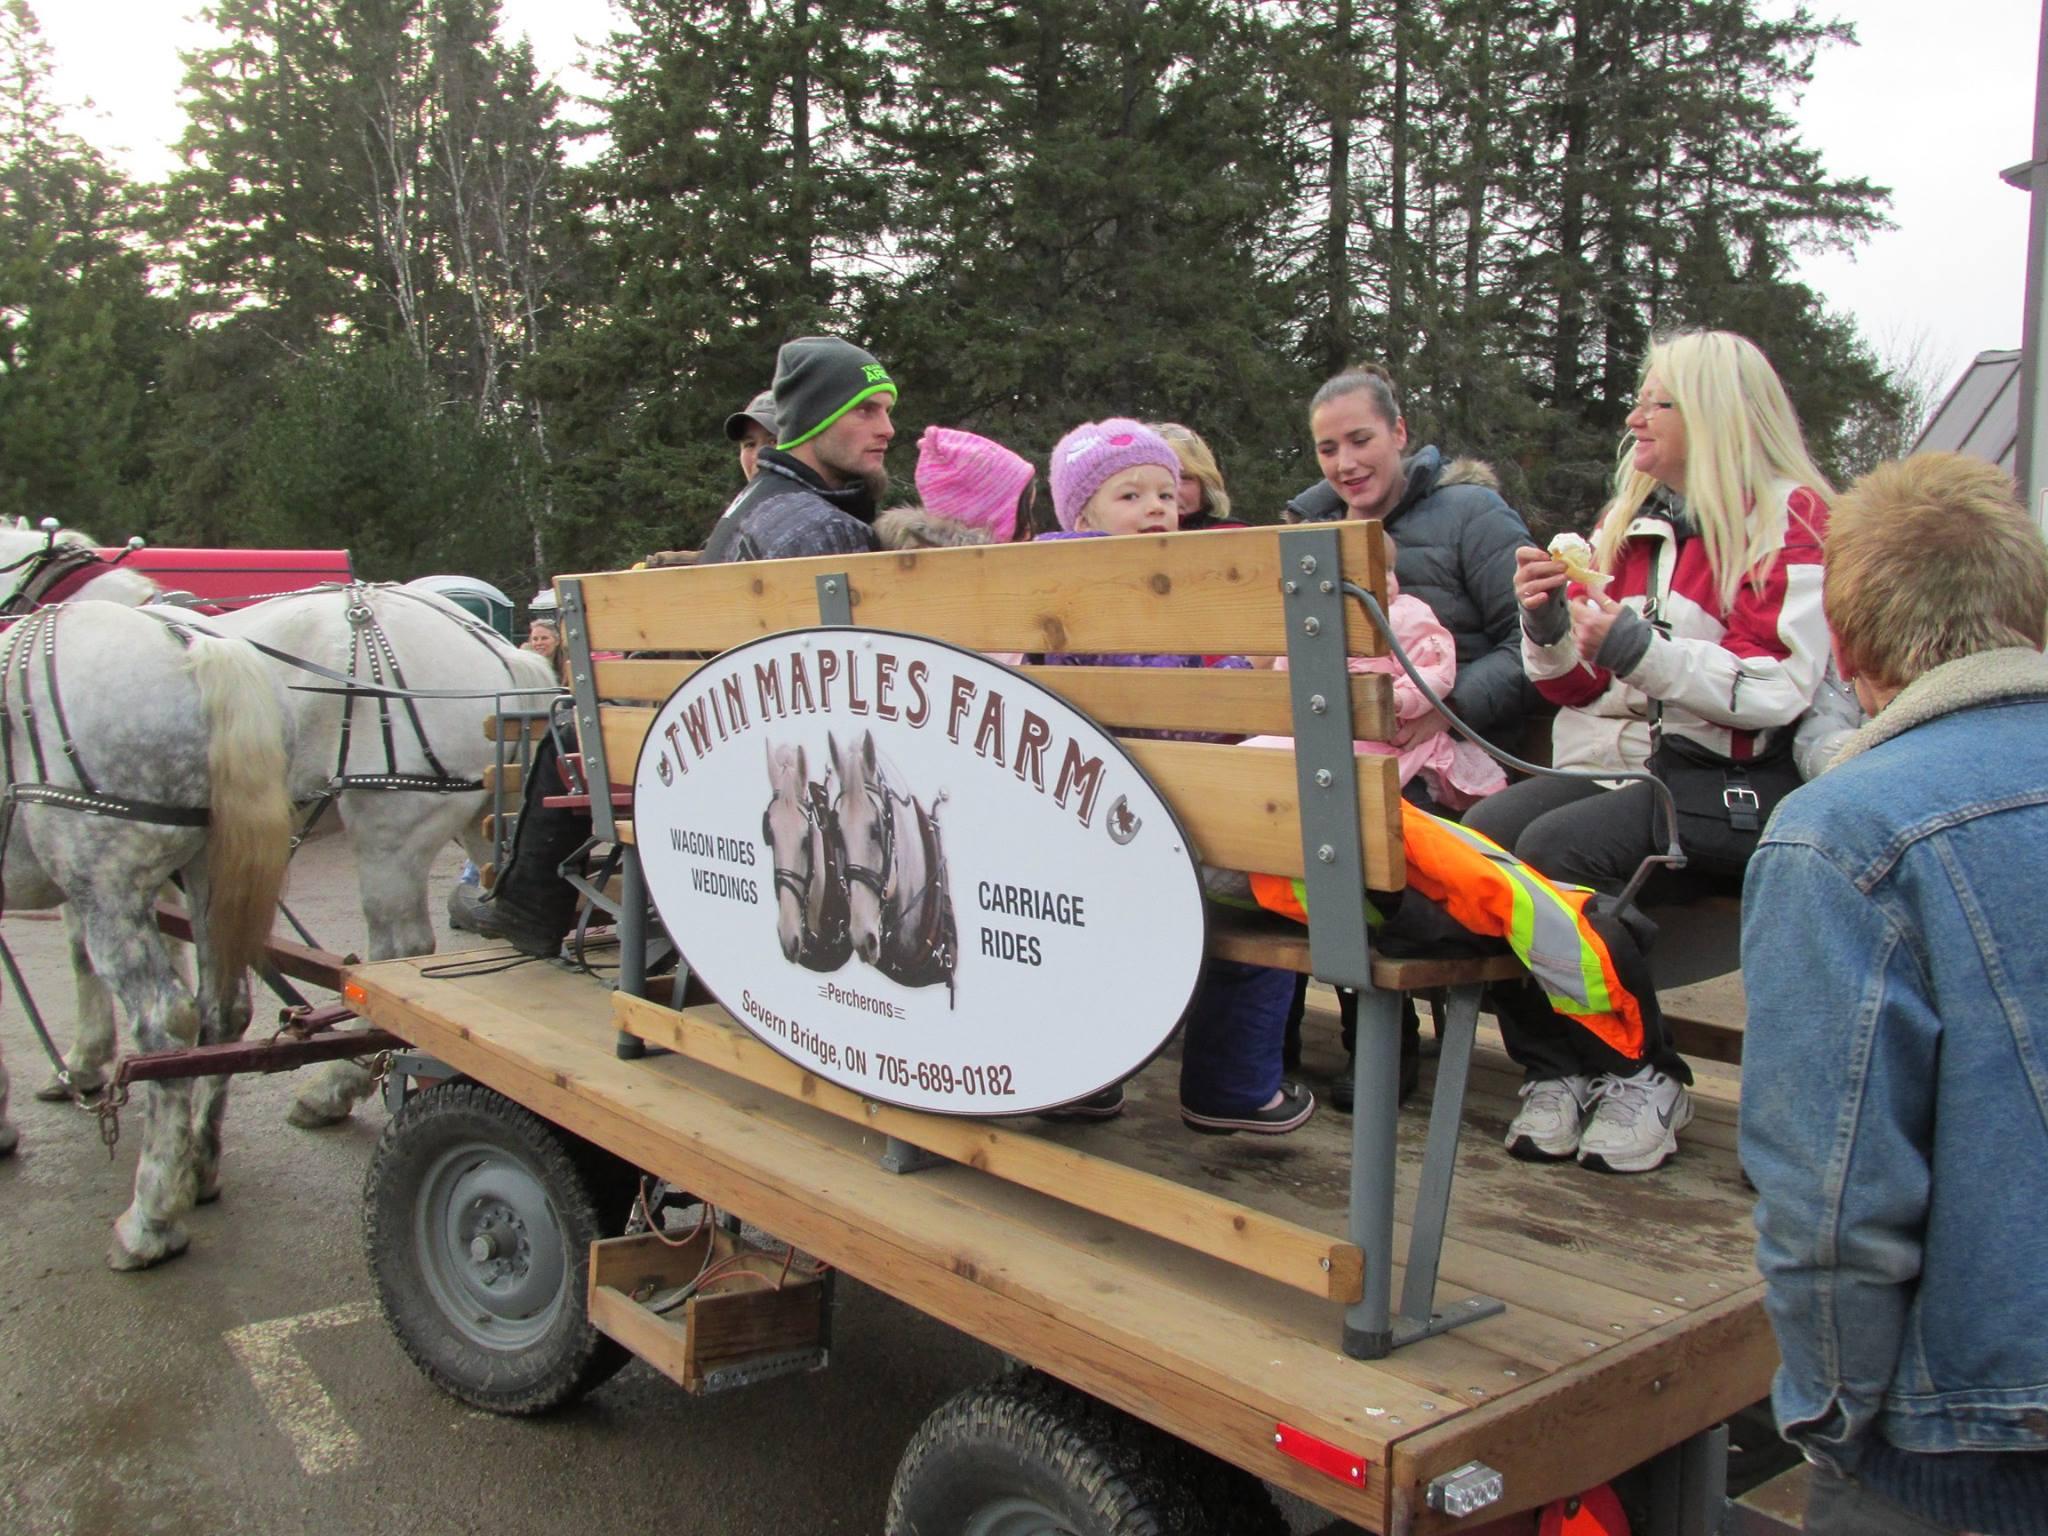 Christmas Begins in Kearney 2018 Wagon Rides